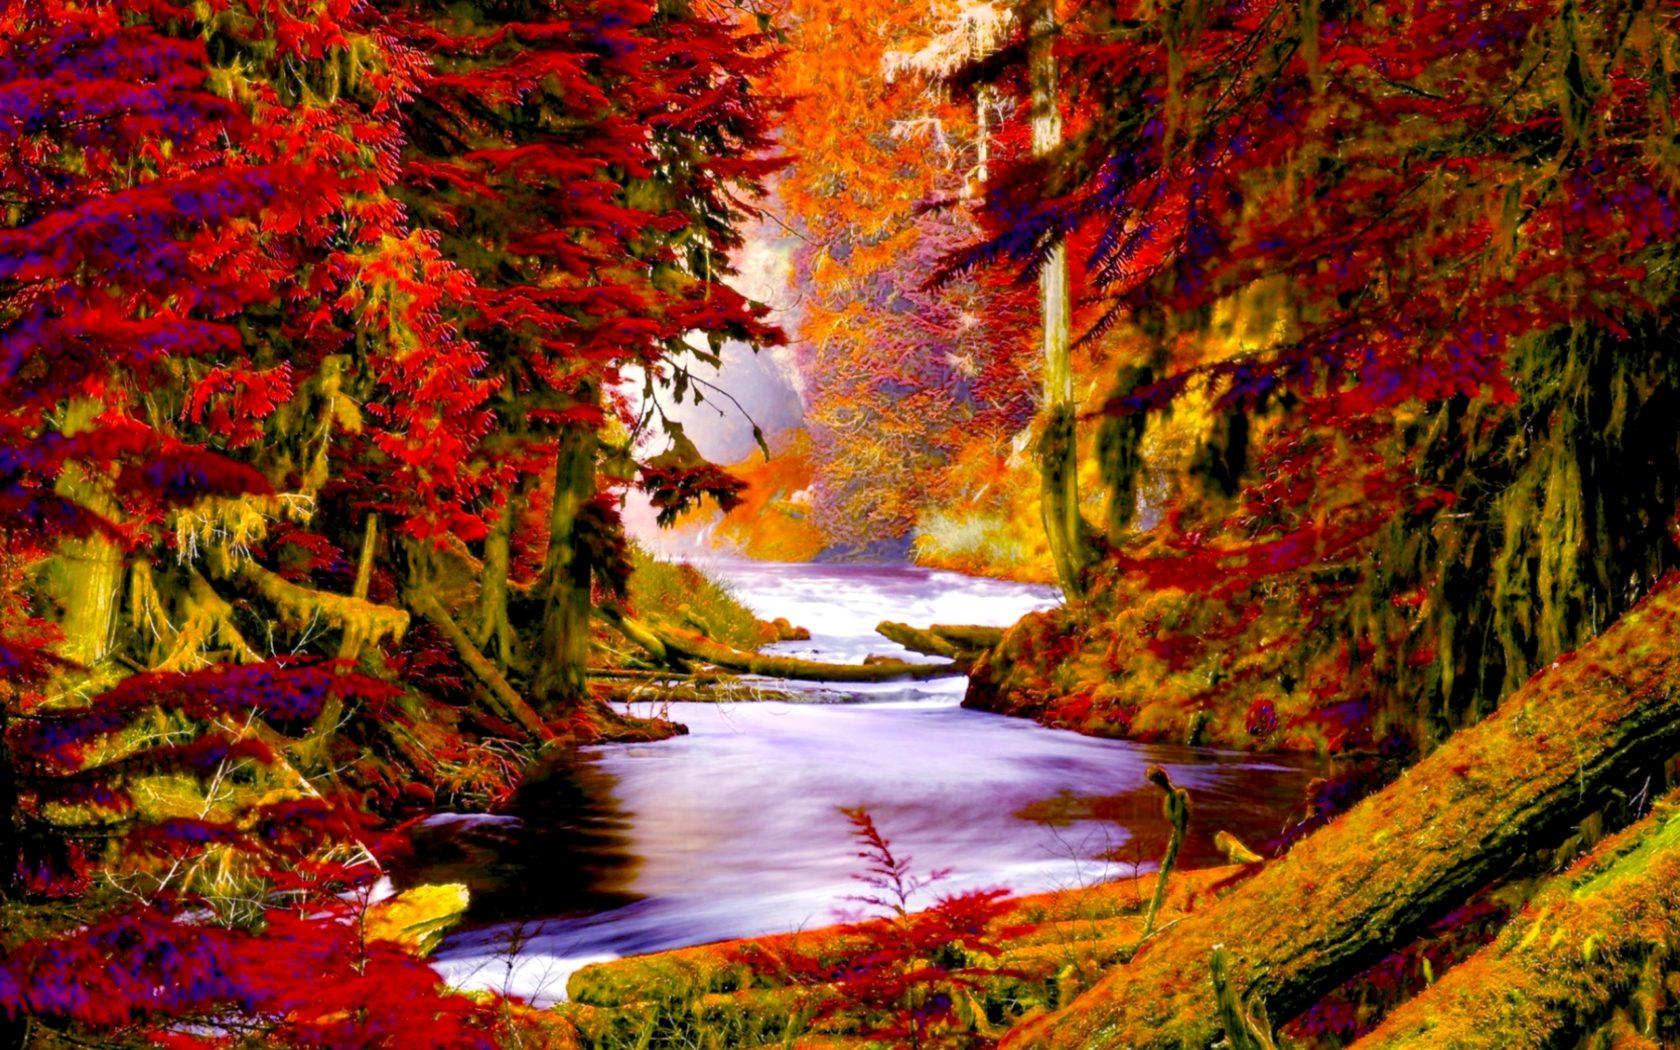 Fall Flowers Desk Background Wallpaper Autumn Forest Creek Wide Wallpaper 503570 Wallpapers13 Com